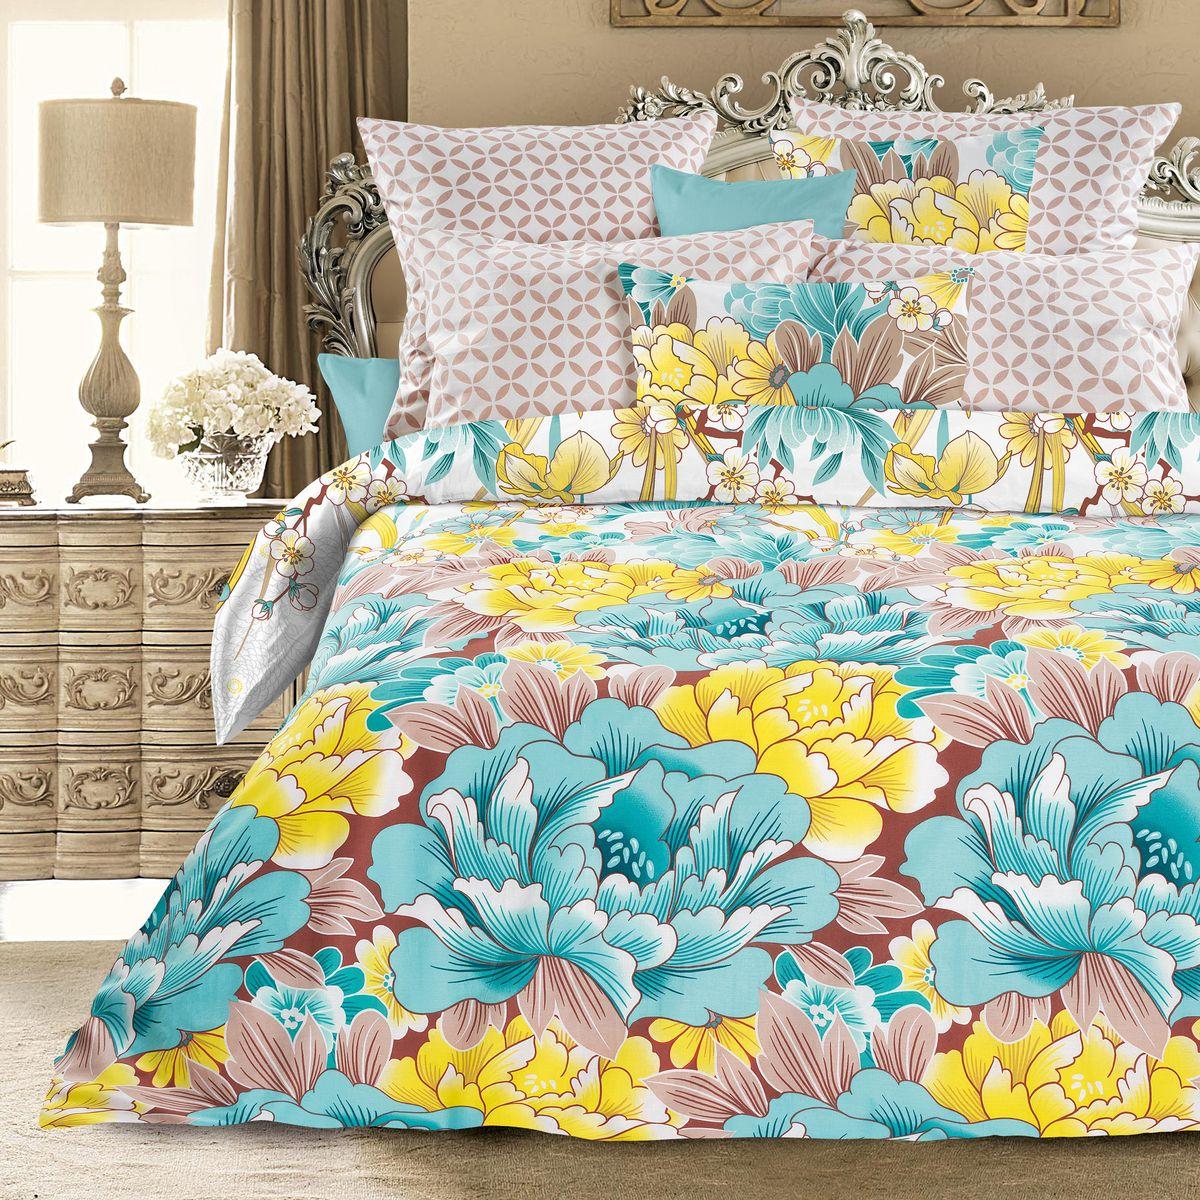 Комплект белья Унисон Кристи, 2-х спальное, наволочки 70 x 70, цвет: бирюзовый. 346523346523